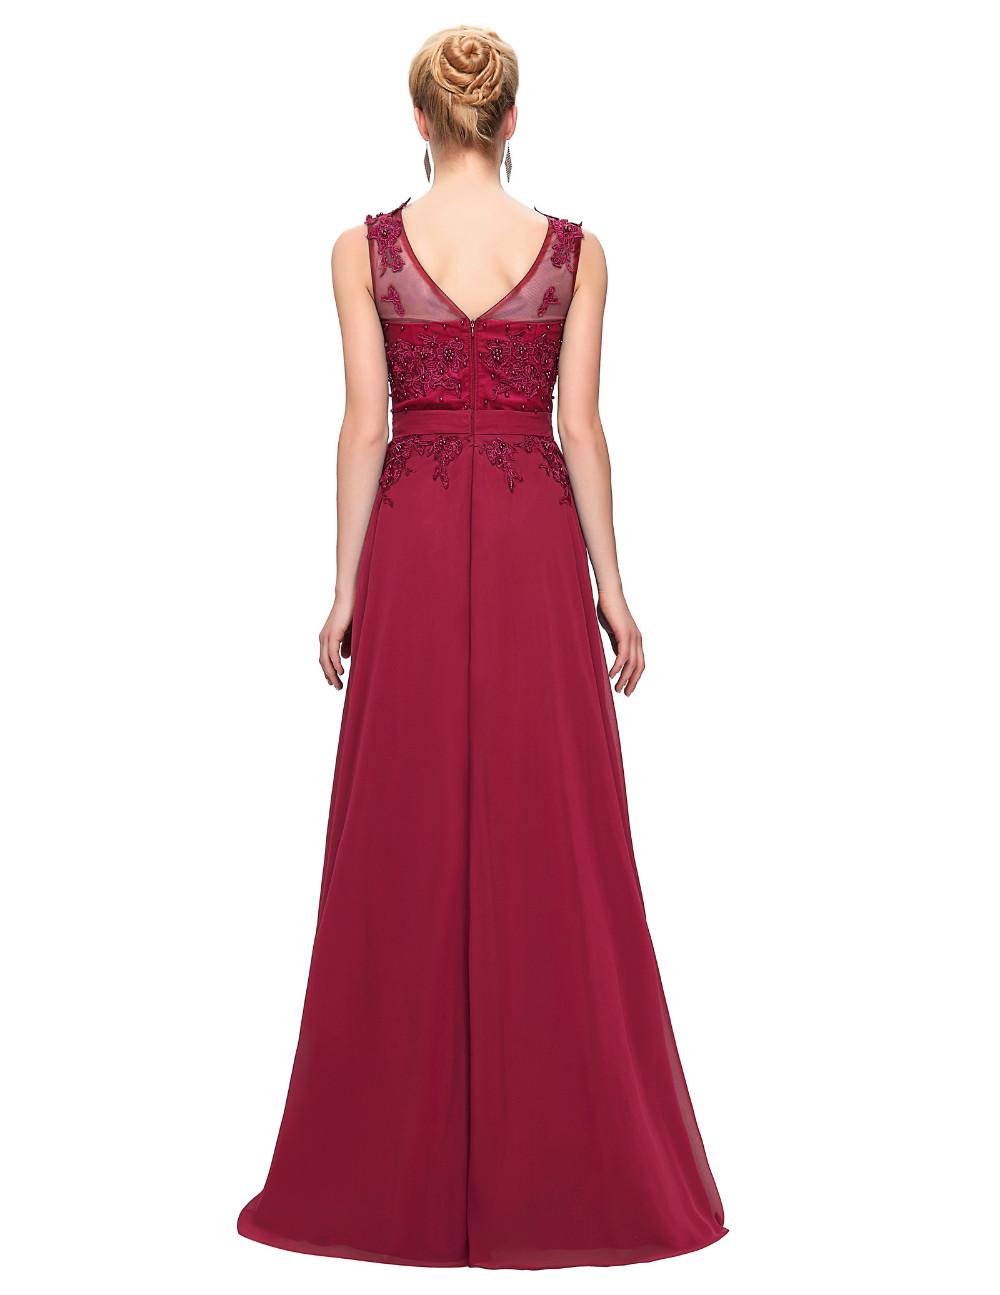 Grace Karin Elegant Long Evening Dresses 2016 Chiffon Pink Purple Red Royal Blue Black Formal Evening Dress Gown Abendkleider 55